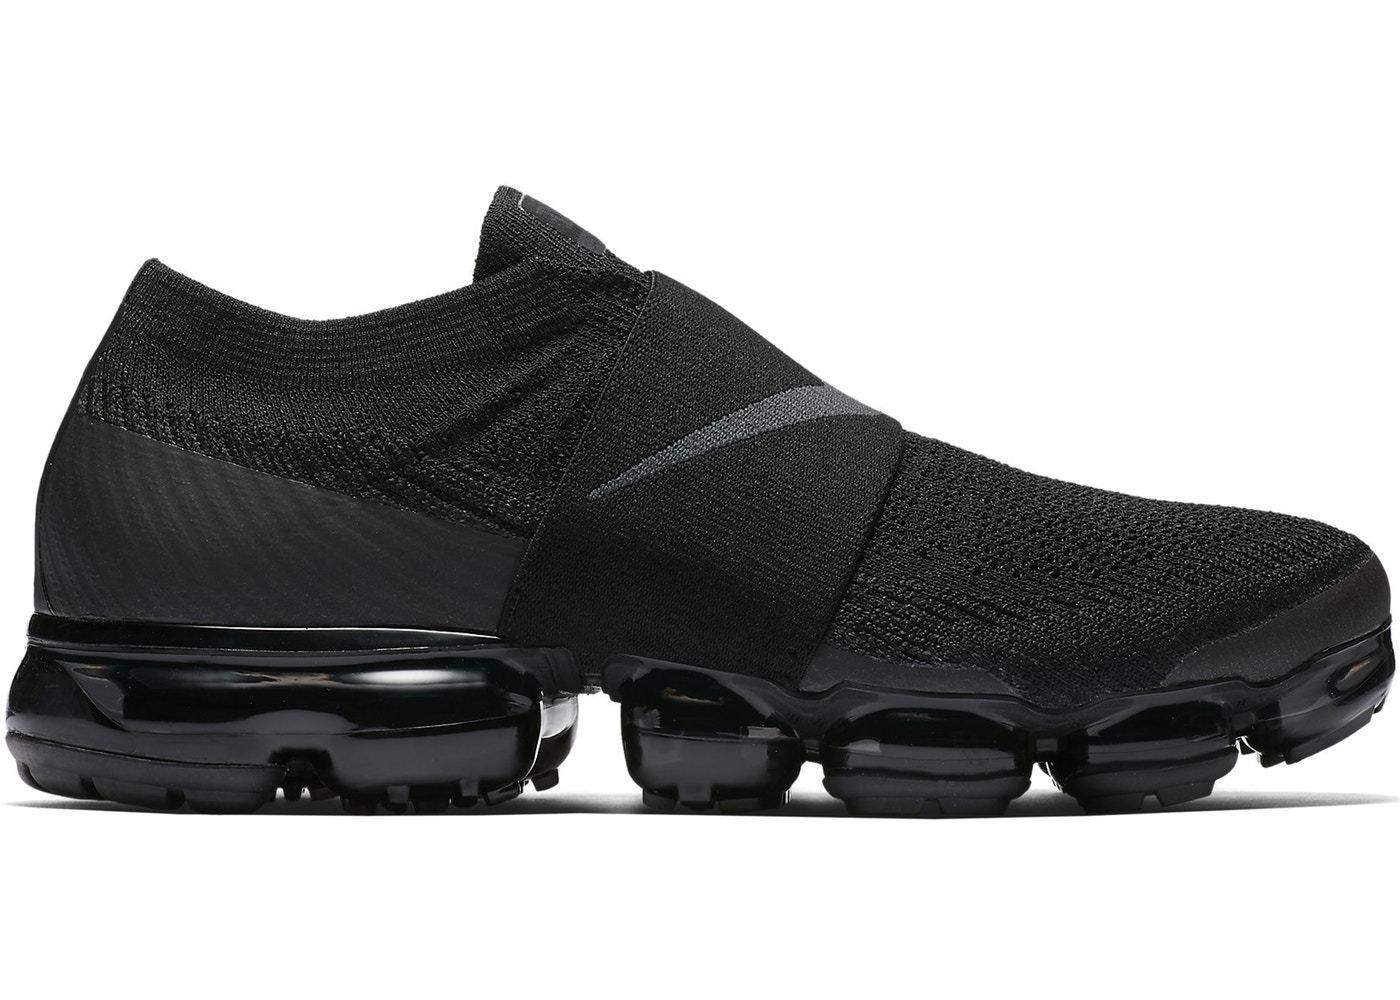 Nike Air Vapormax Flyknit Moc Triple Black Size 6. AH3397-004 Max 1 90 95 97